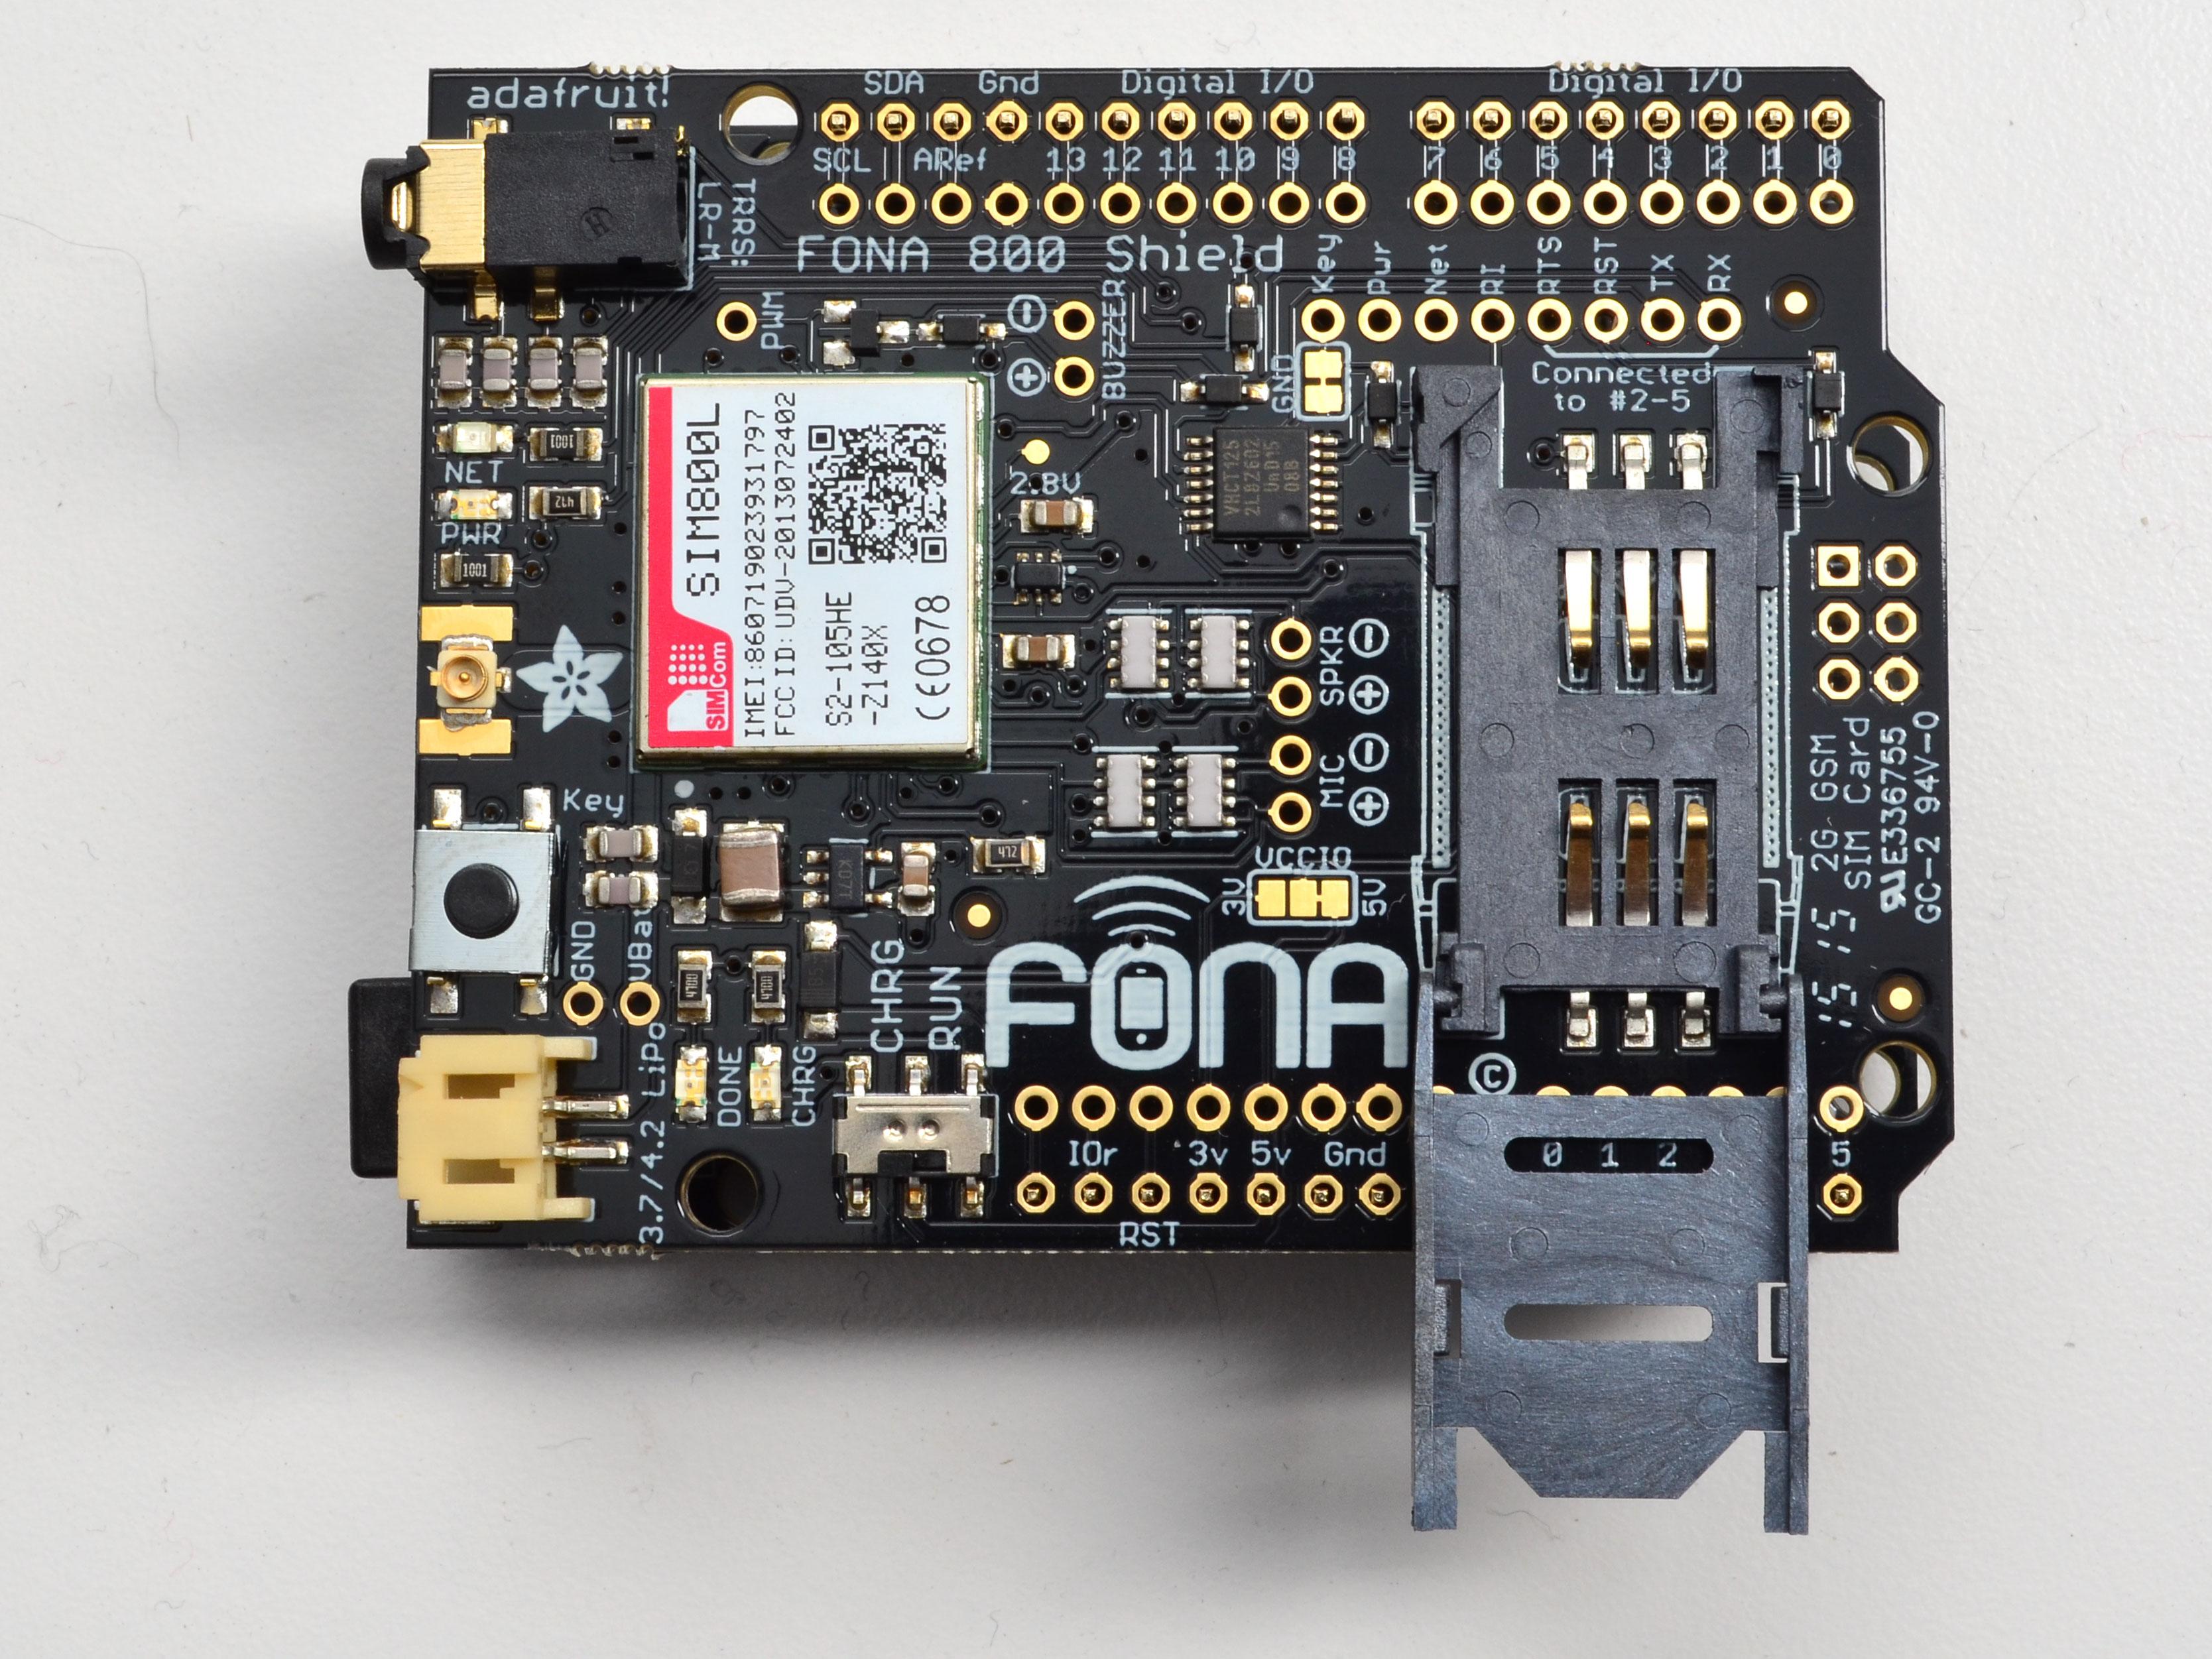 adafruit_products_simopen.jpg